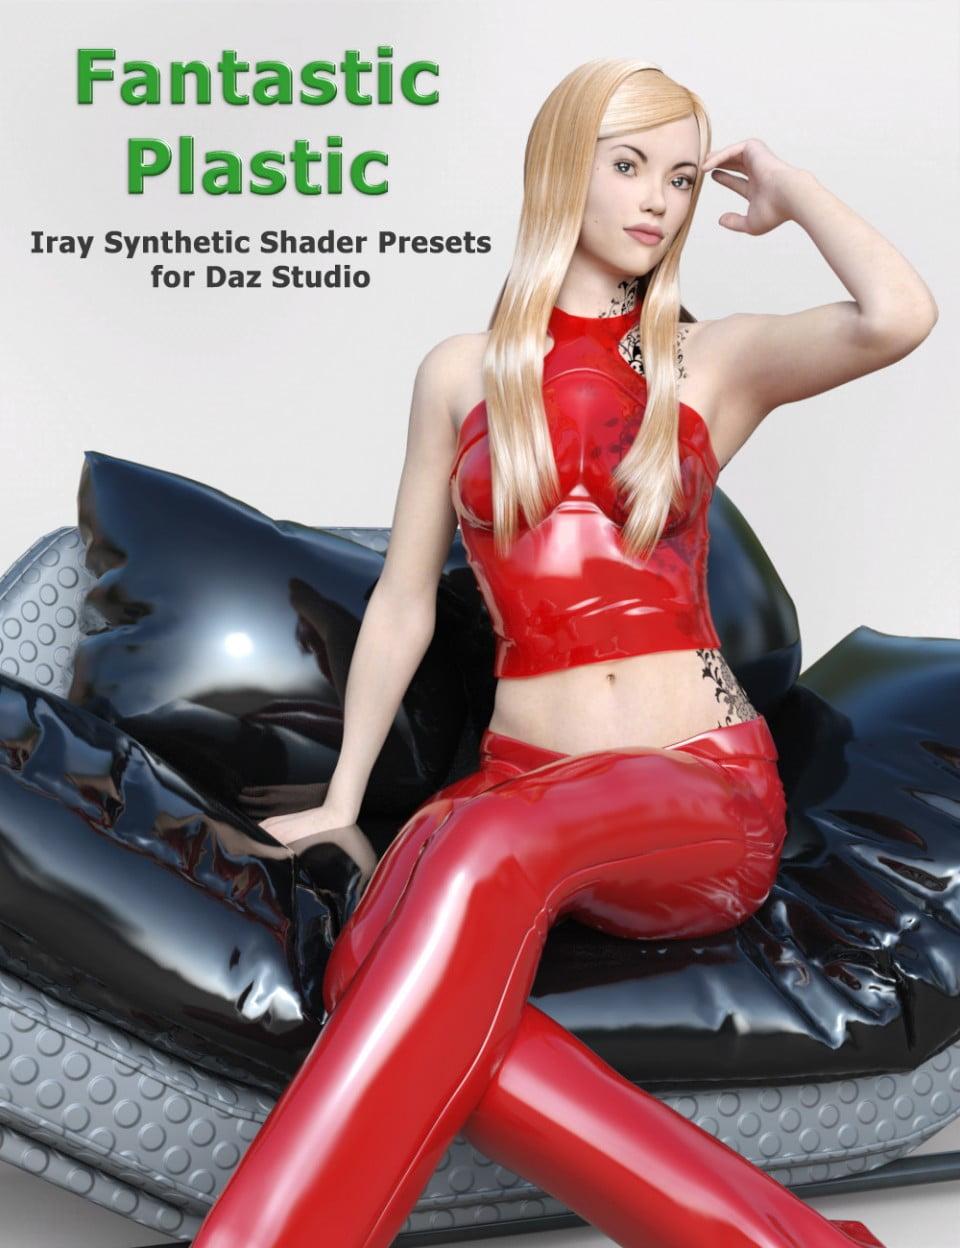 E1 Fantastic Plastic - Iray Synthetic Shader Presets for Daz Studio